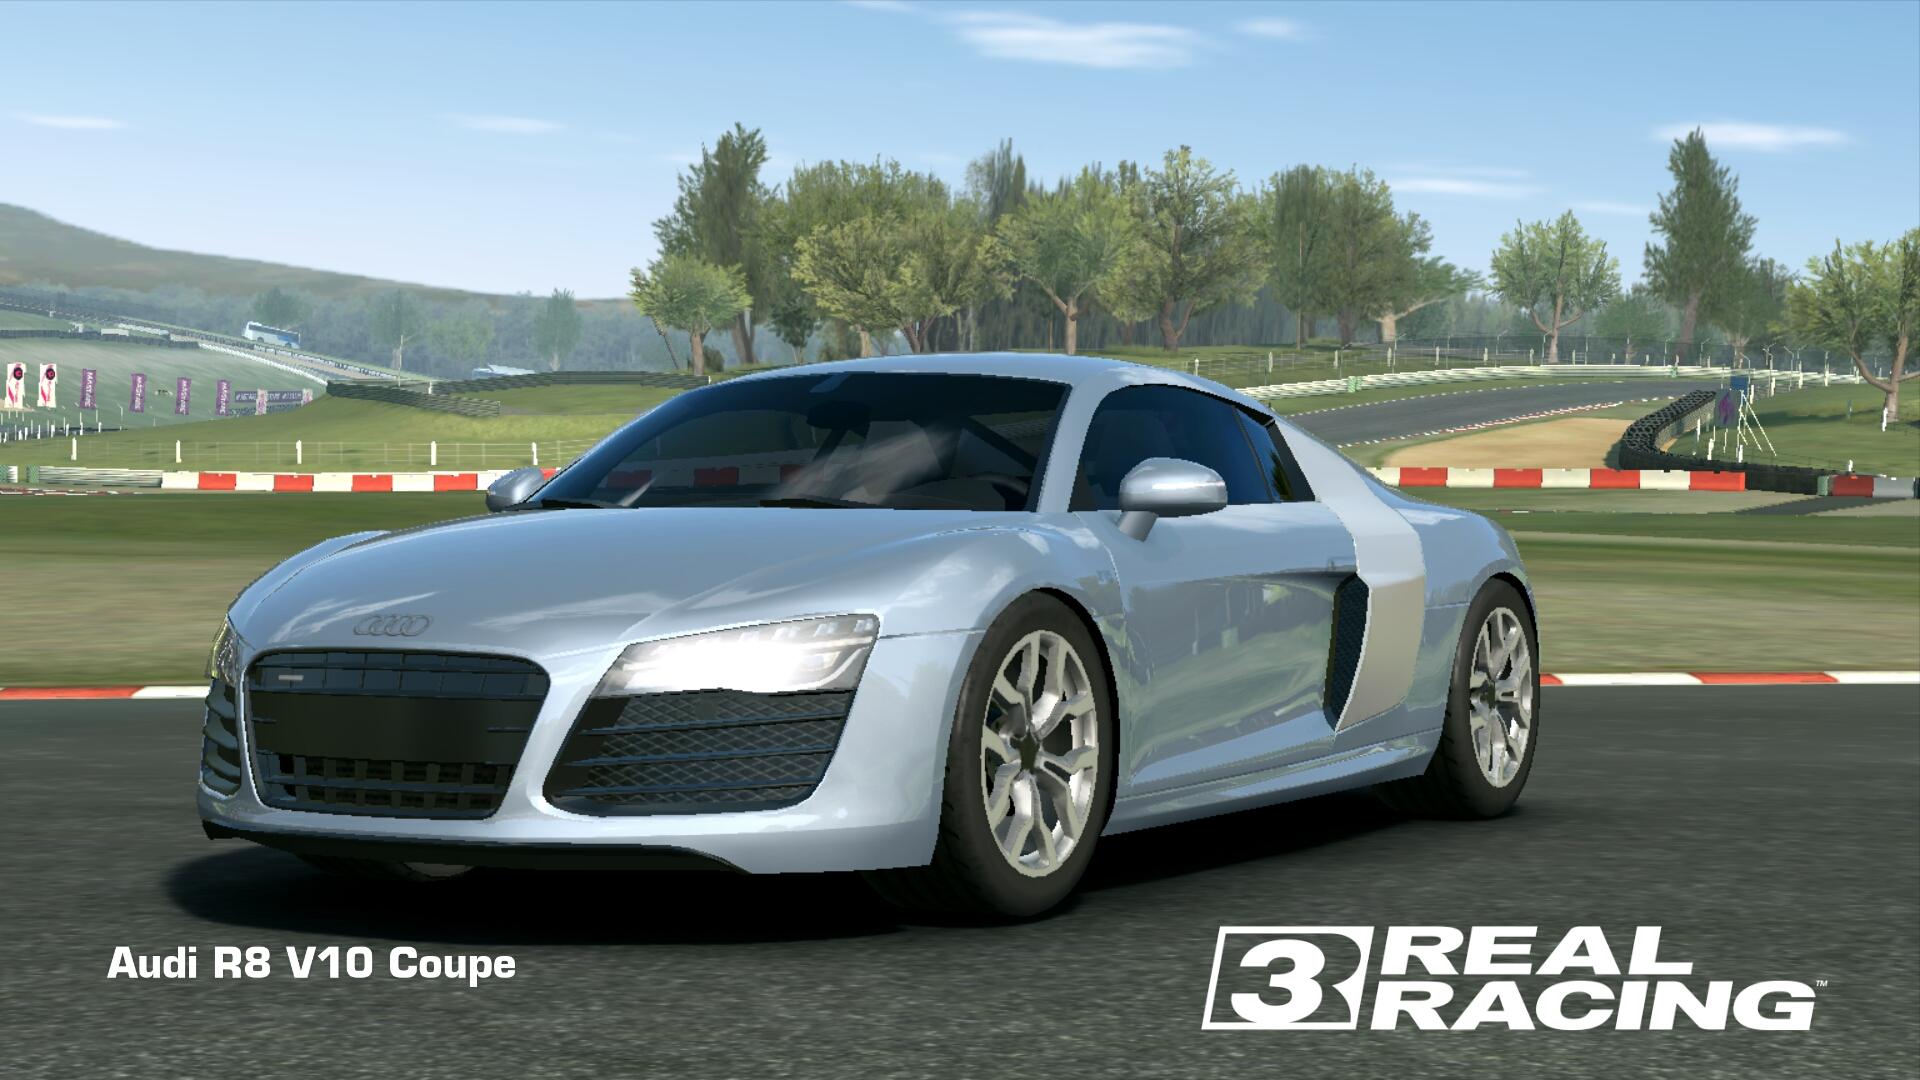 Showcase Audi R8 V10 Coupe